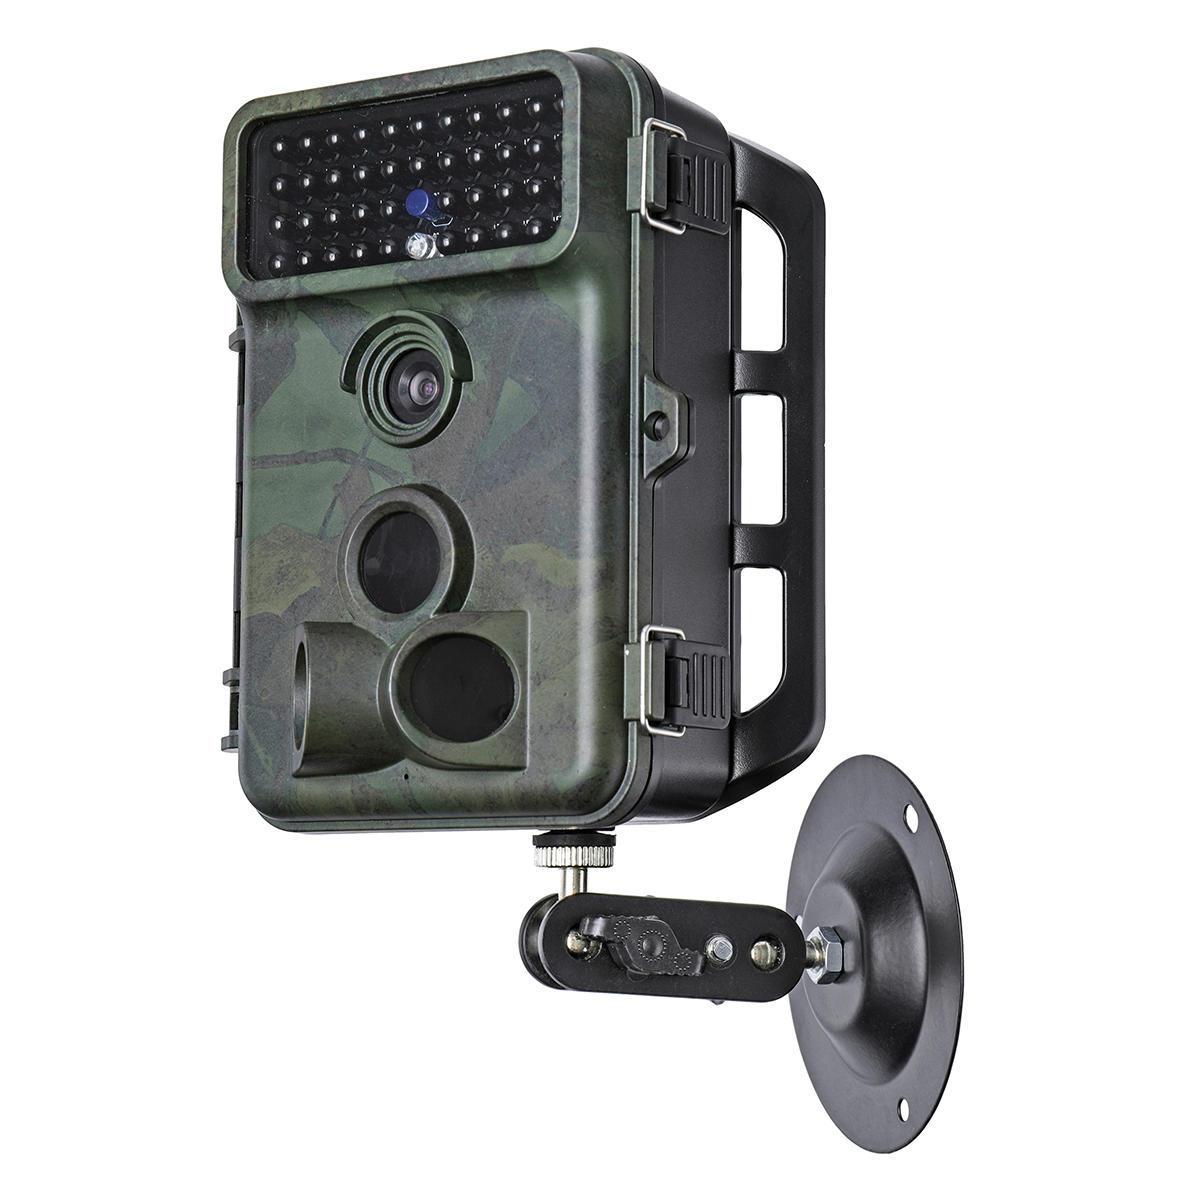 KALOAD Hunting Camera Motion Activated H801 16MP Deer Tree Digital Waterproof Trail Wildlife Camera - 5